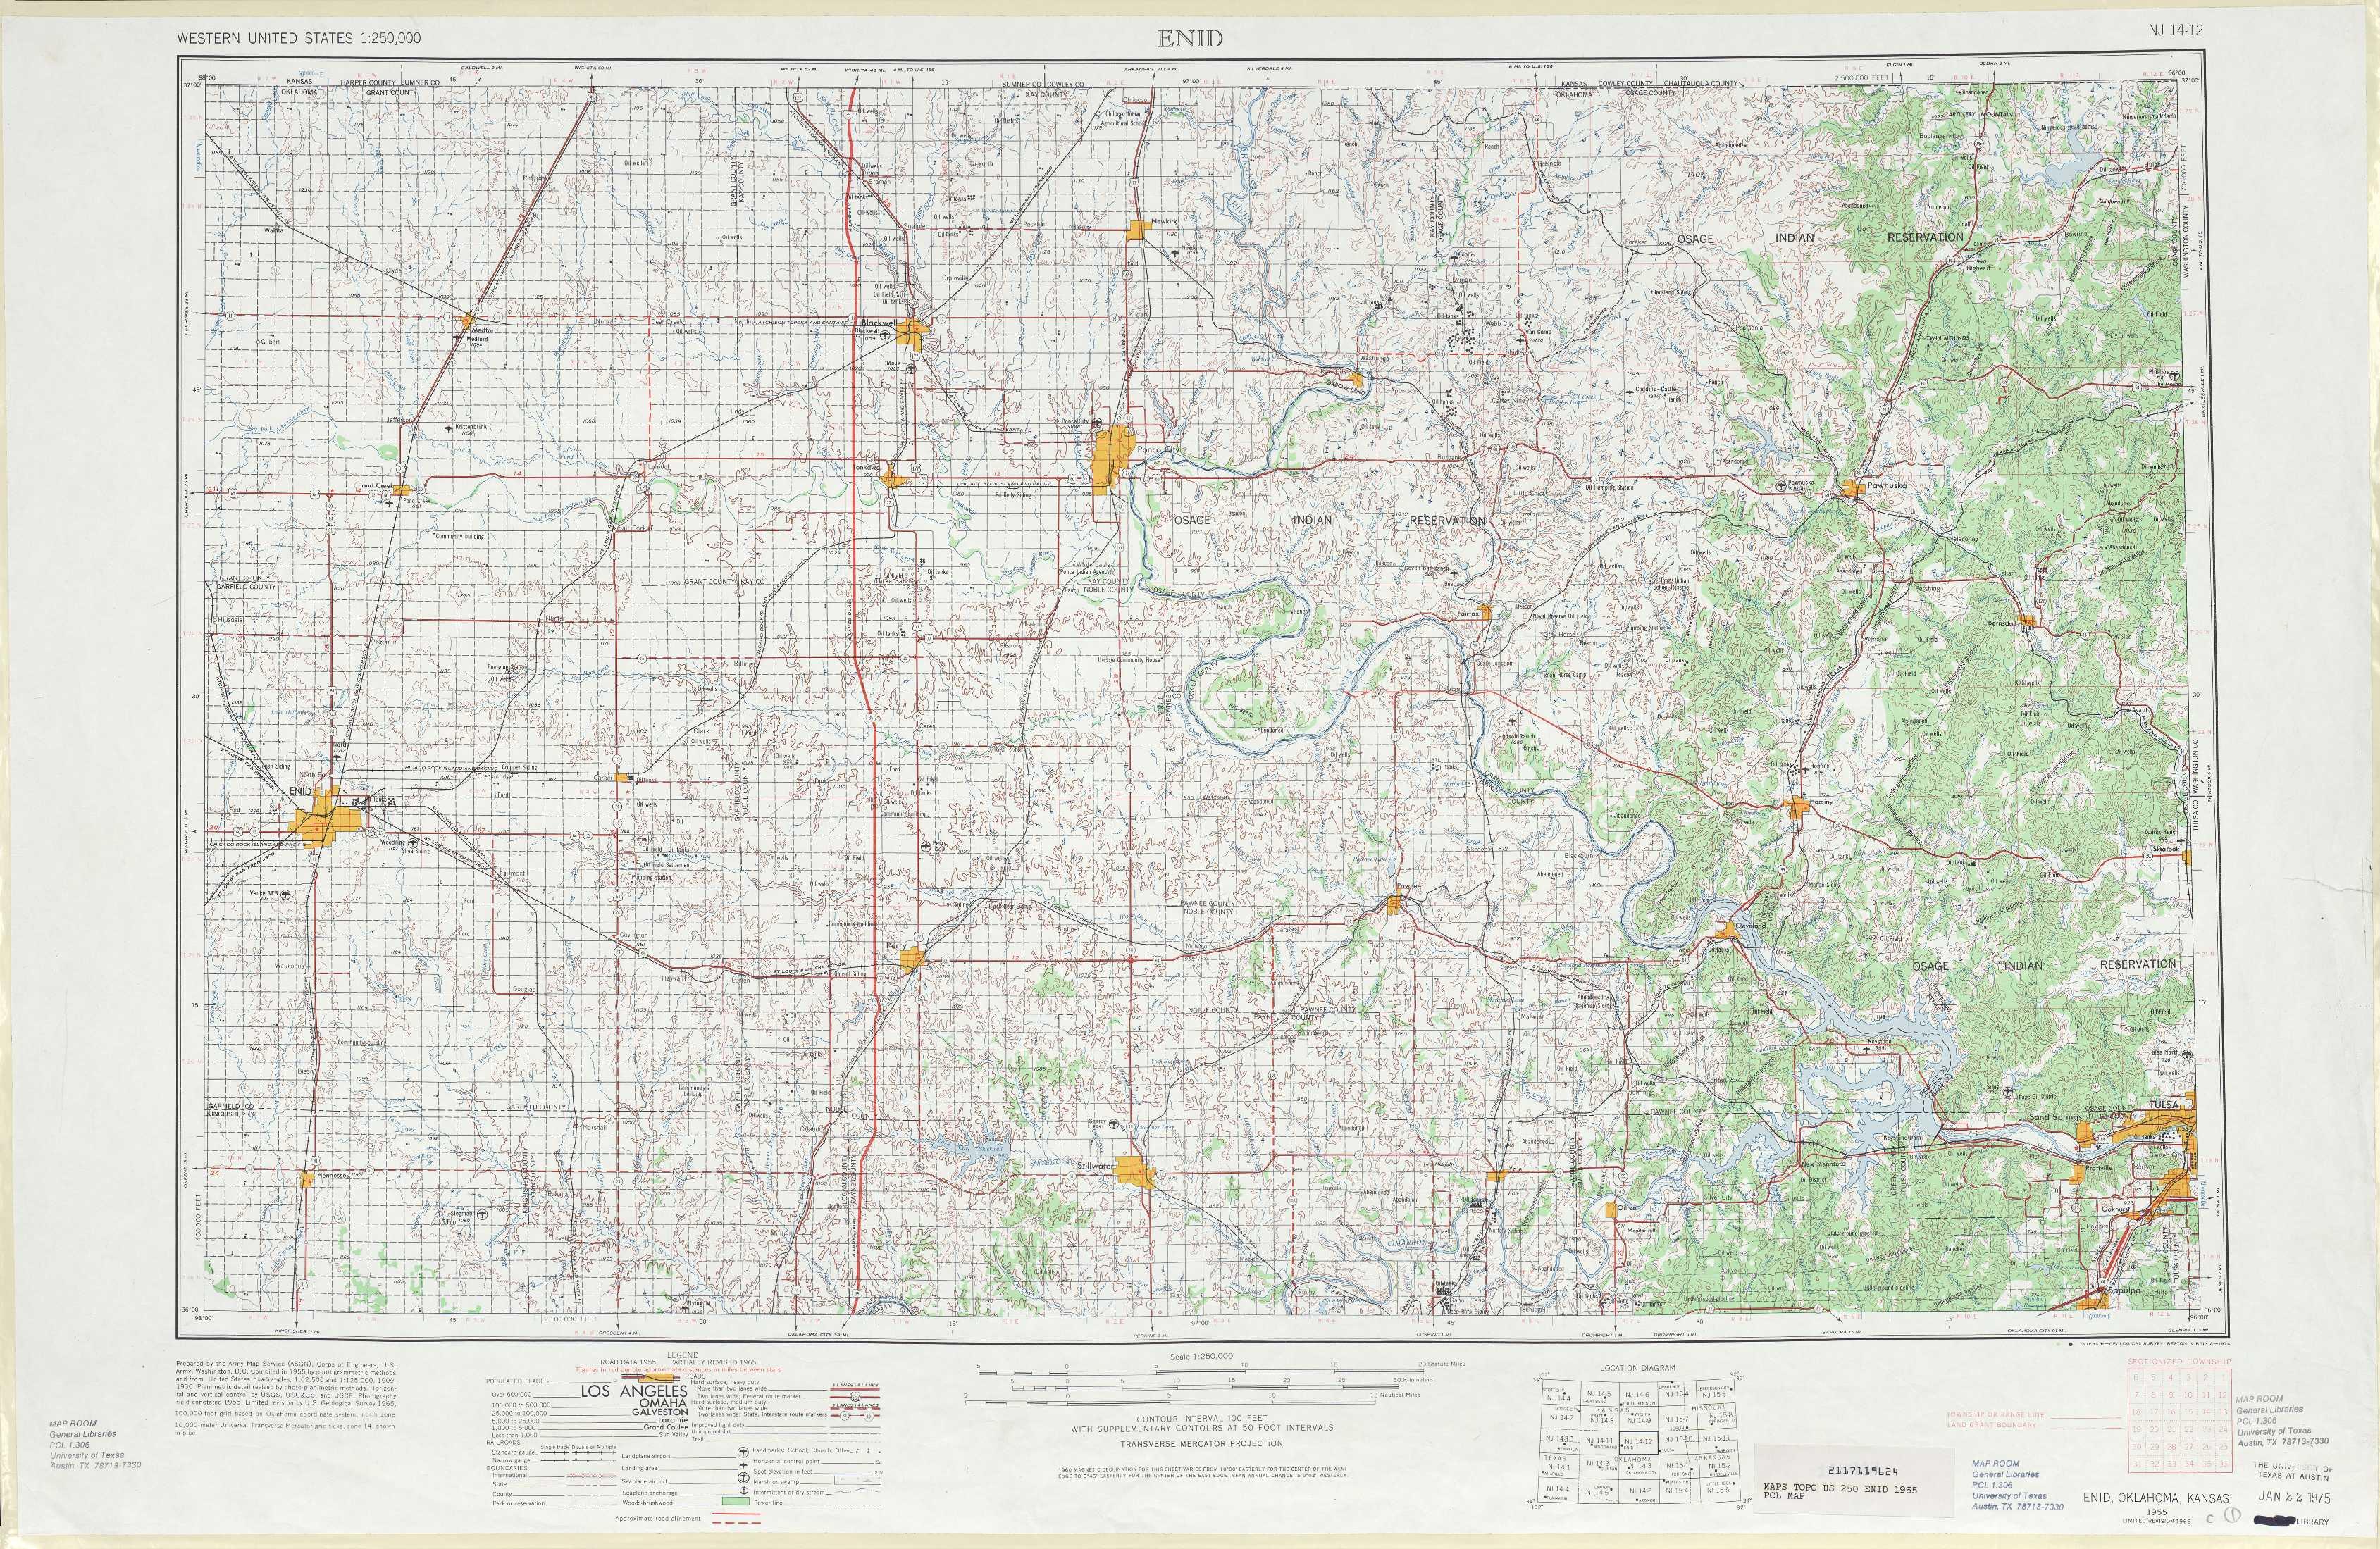 Enid topographic maps OK USGS Topo Quad 36096a1 at 1250000 scale